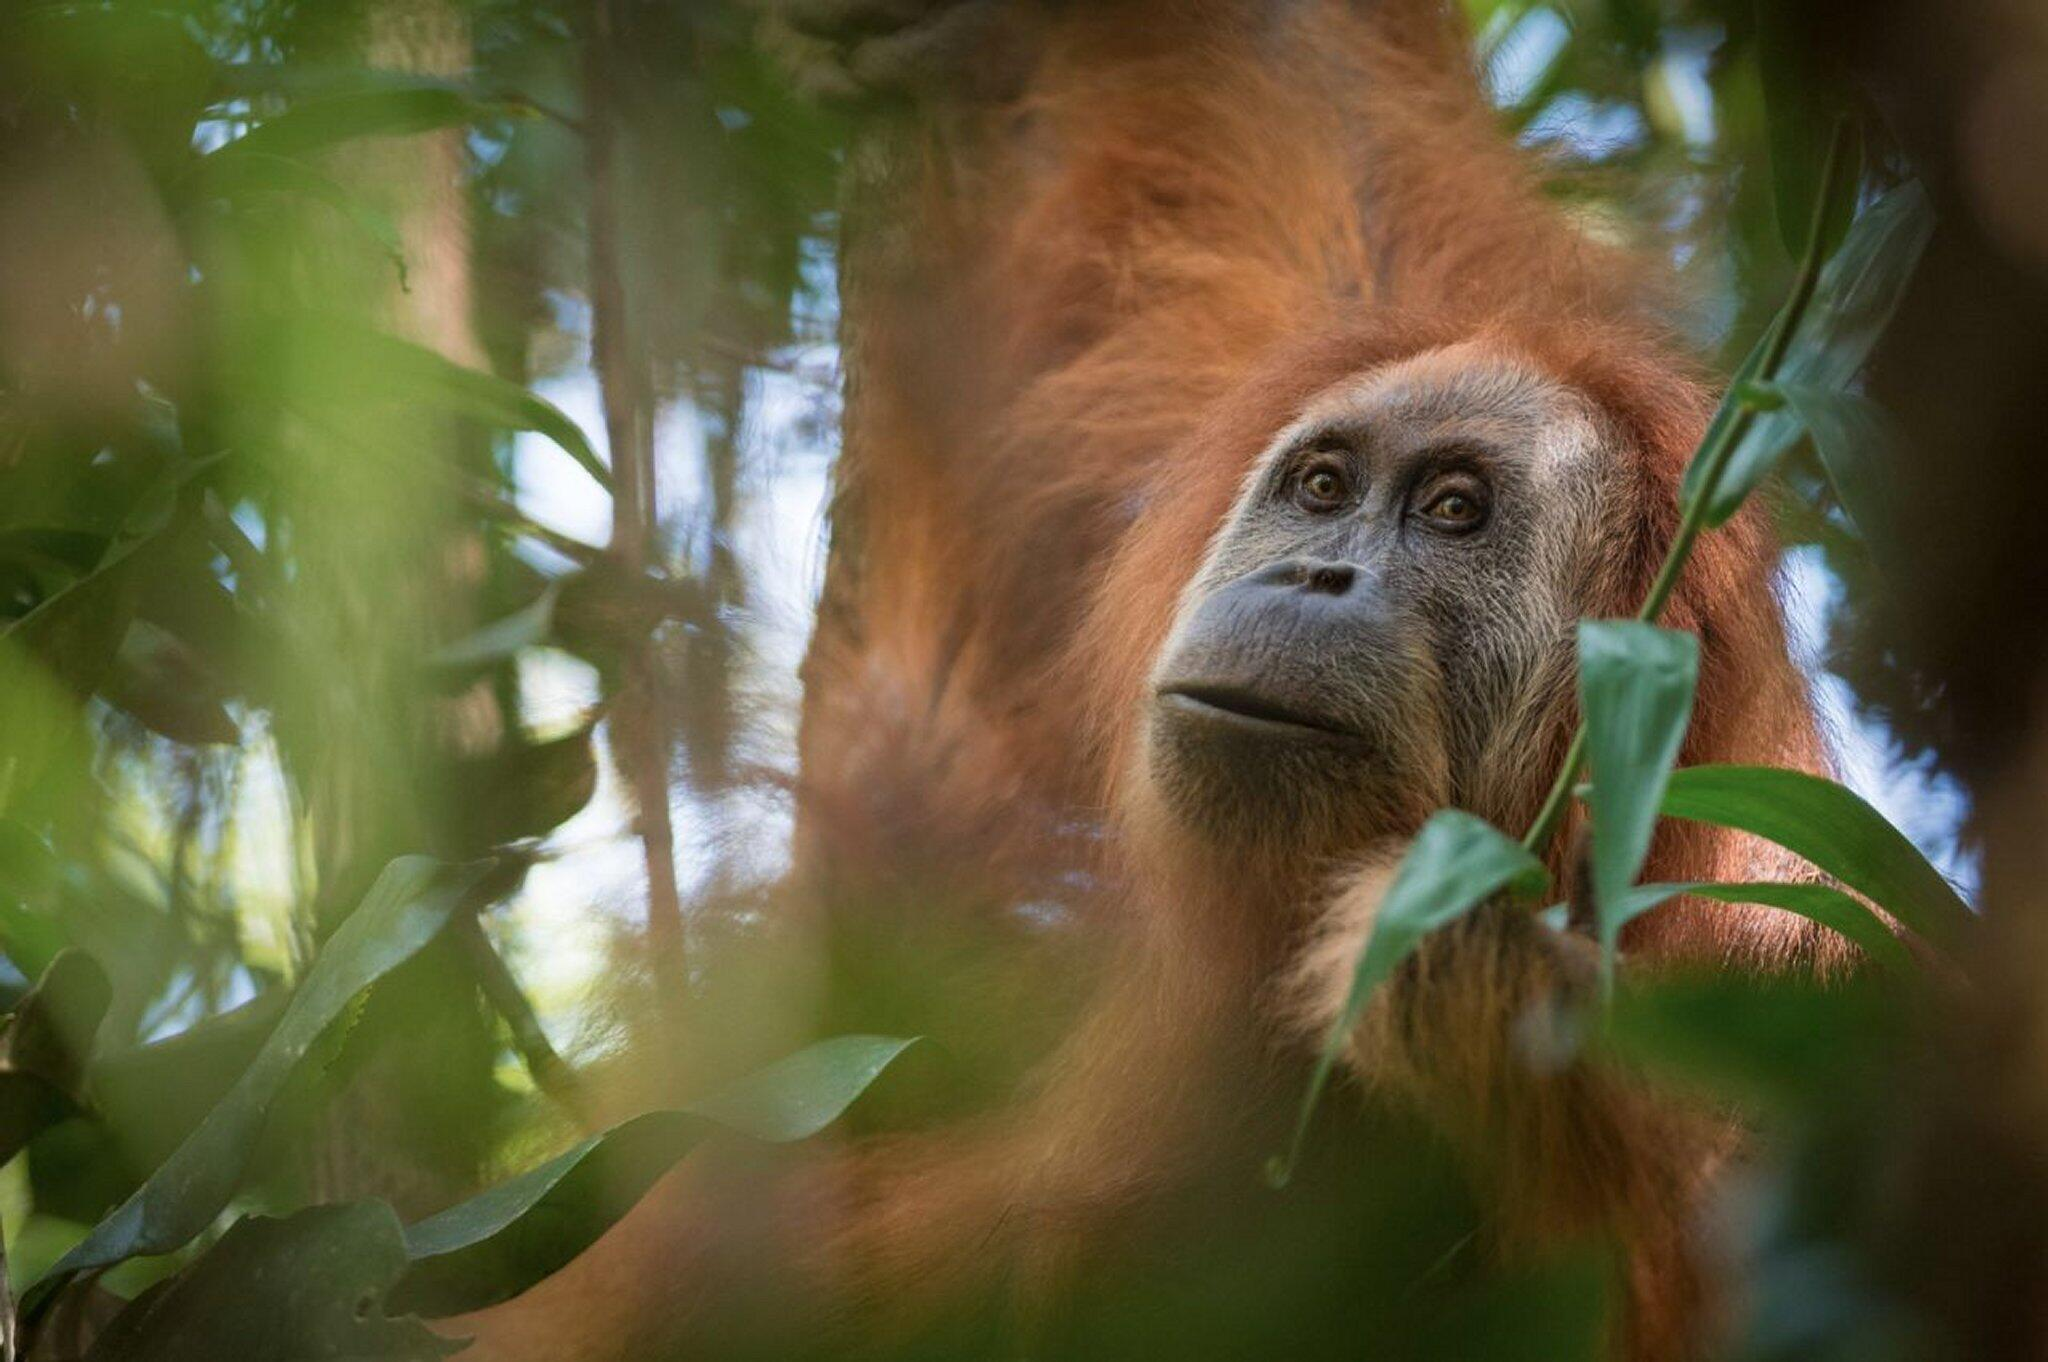 Bild zu Neue Orang-Utan-Art auf Sumatra entdeckt